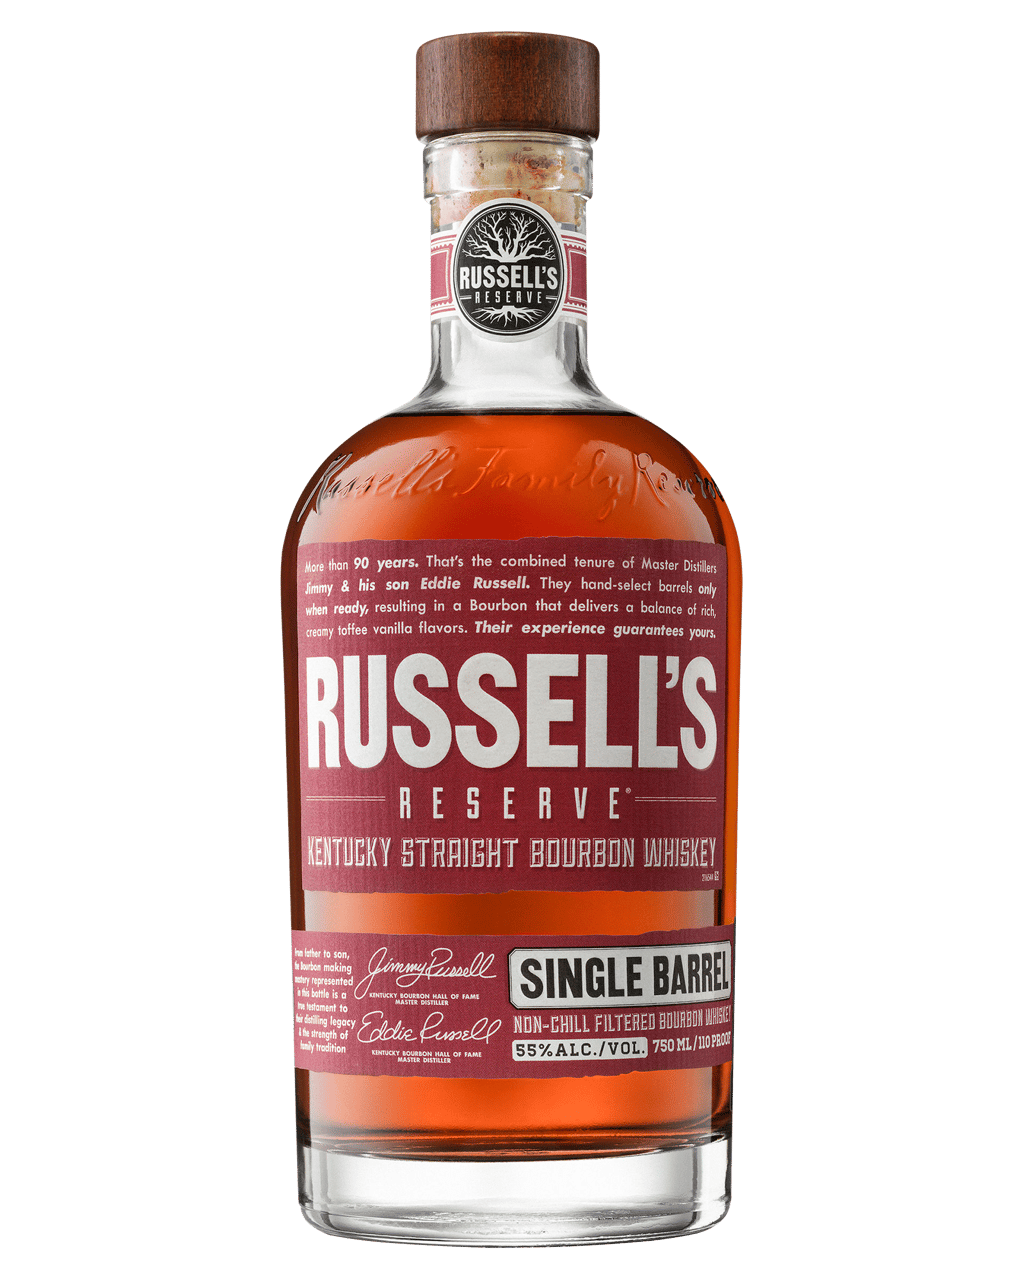 Buy Russell's Reserve Single Barrel Kentucky Straight Bourbon